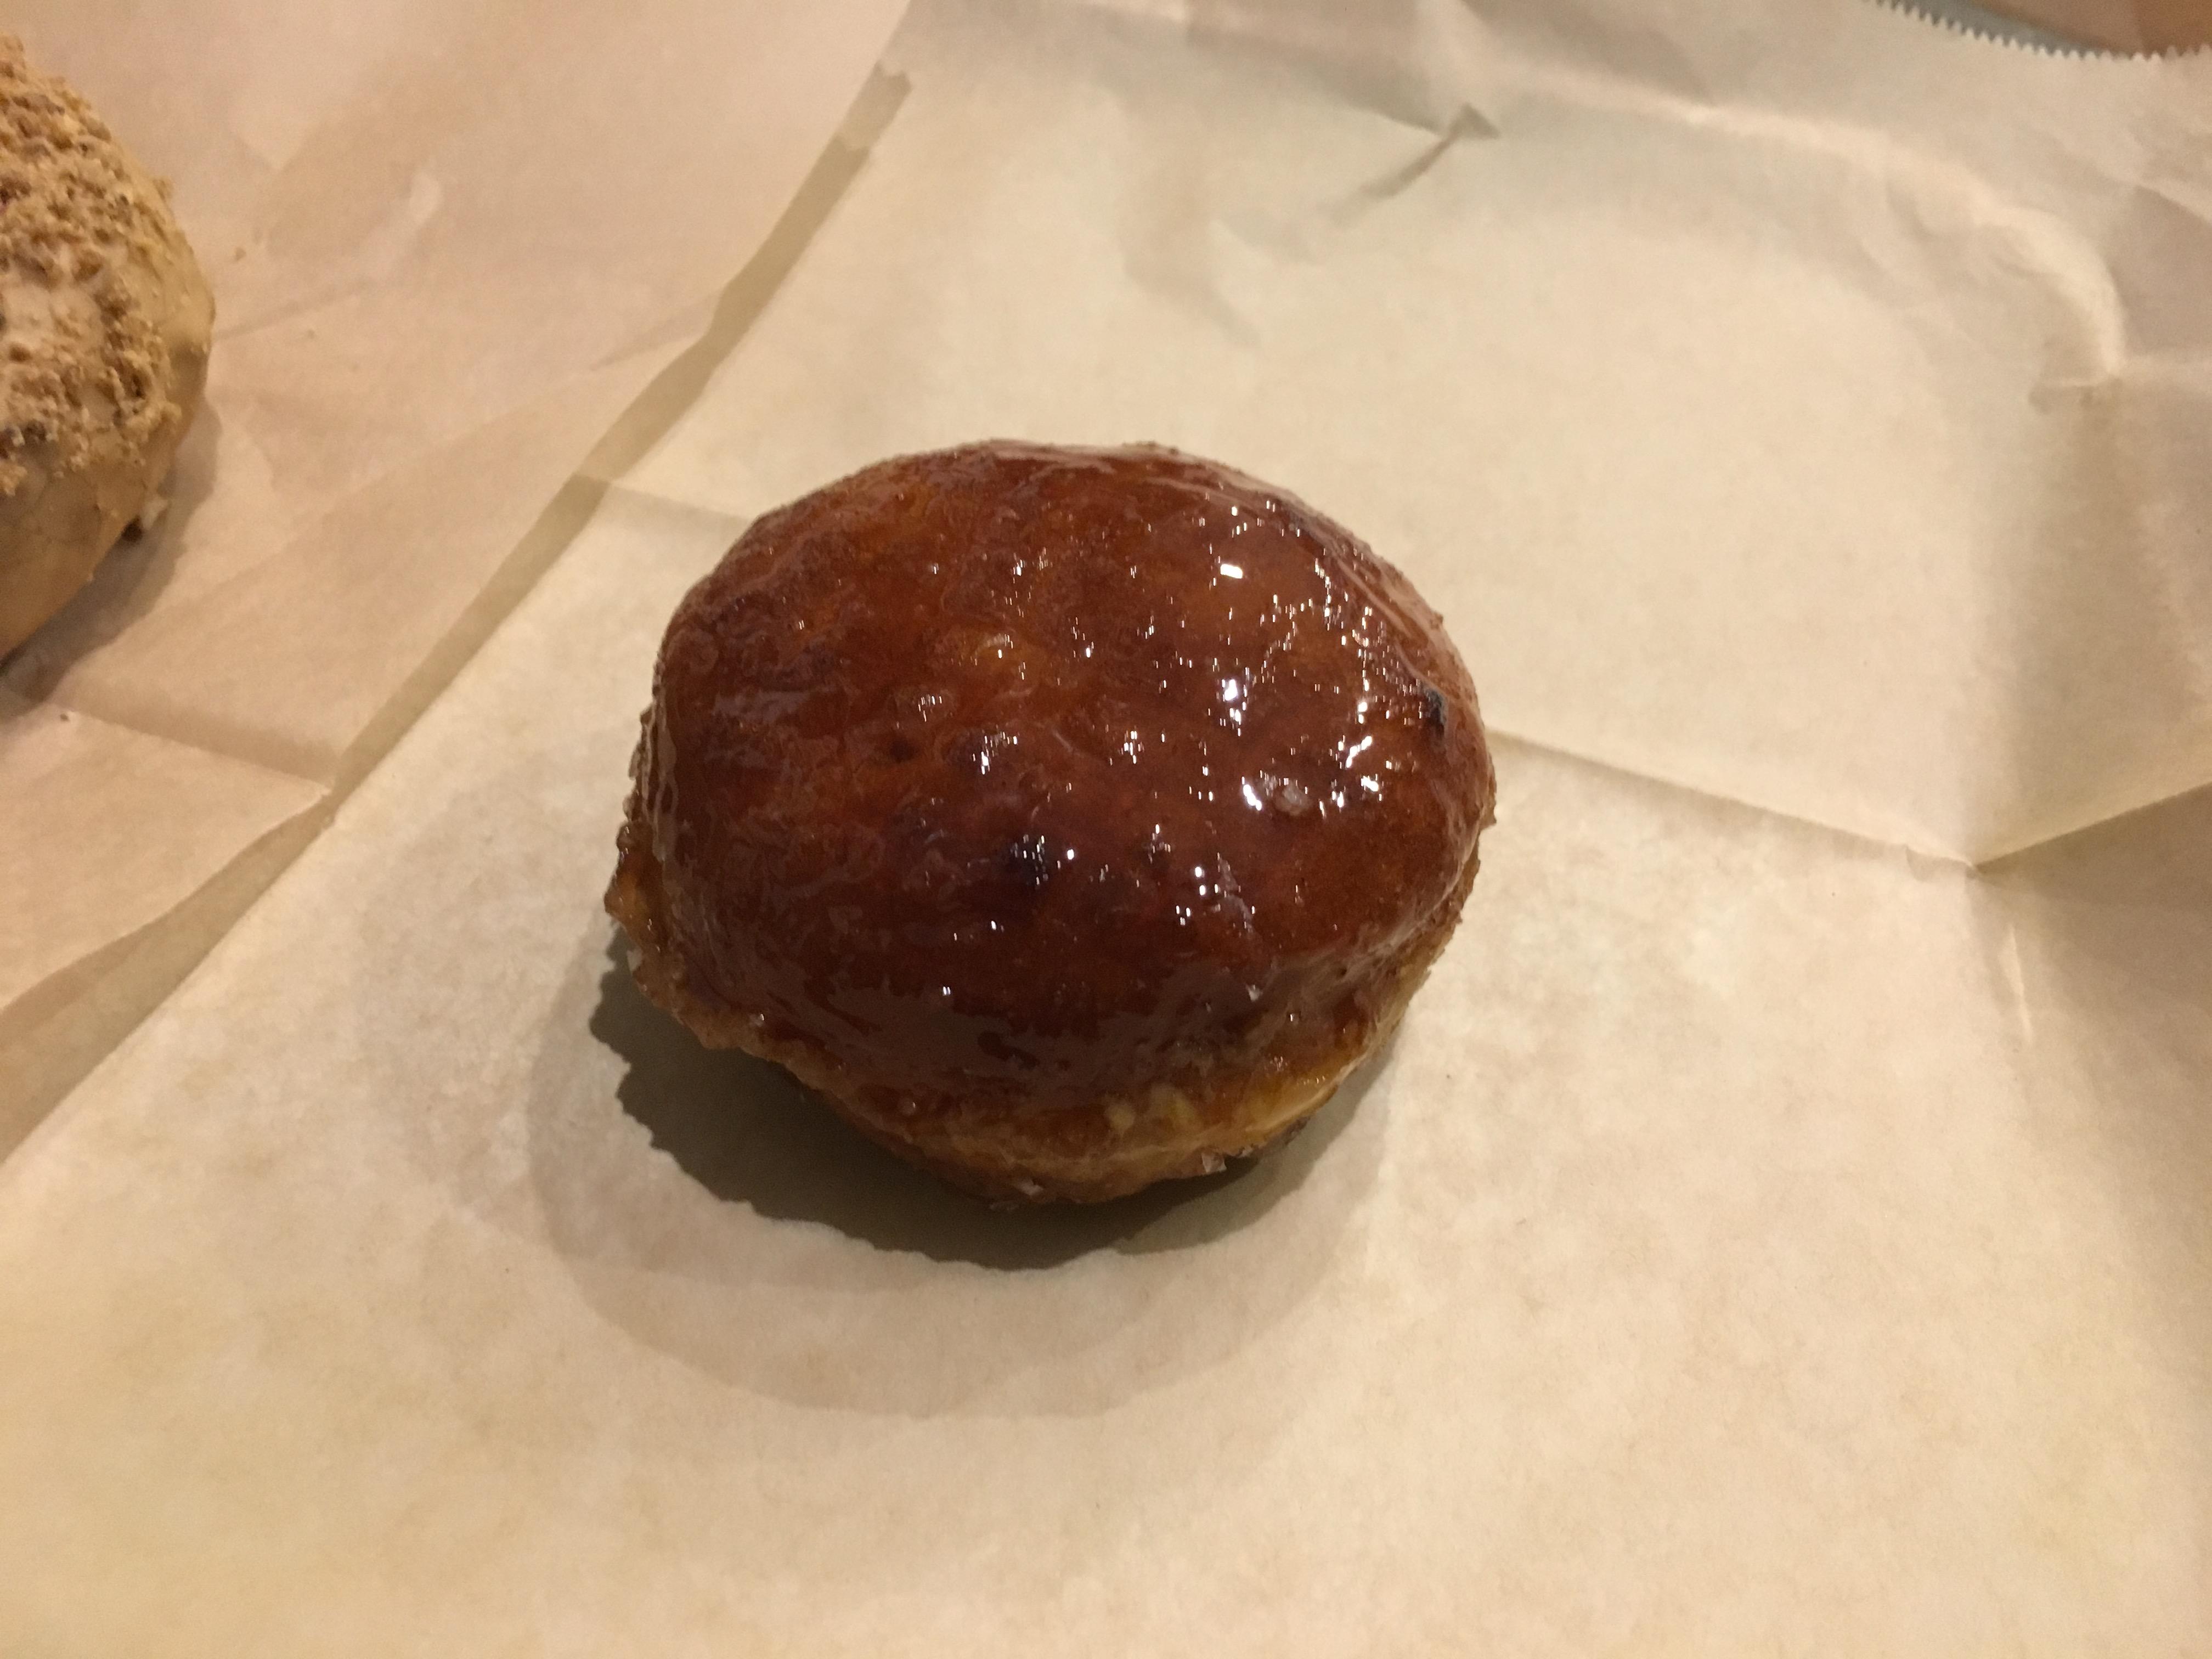 New York Food - Doughnut Plant Creme Brulee doughnut